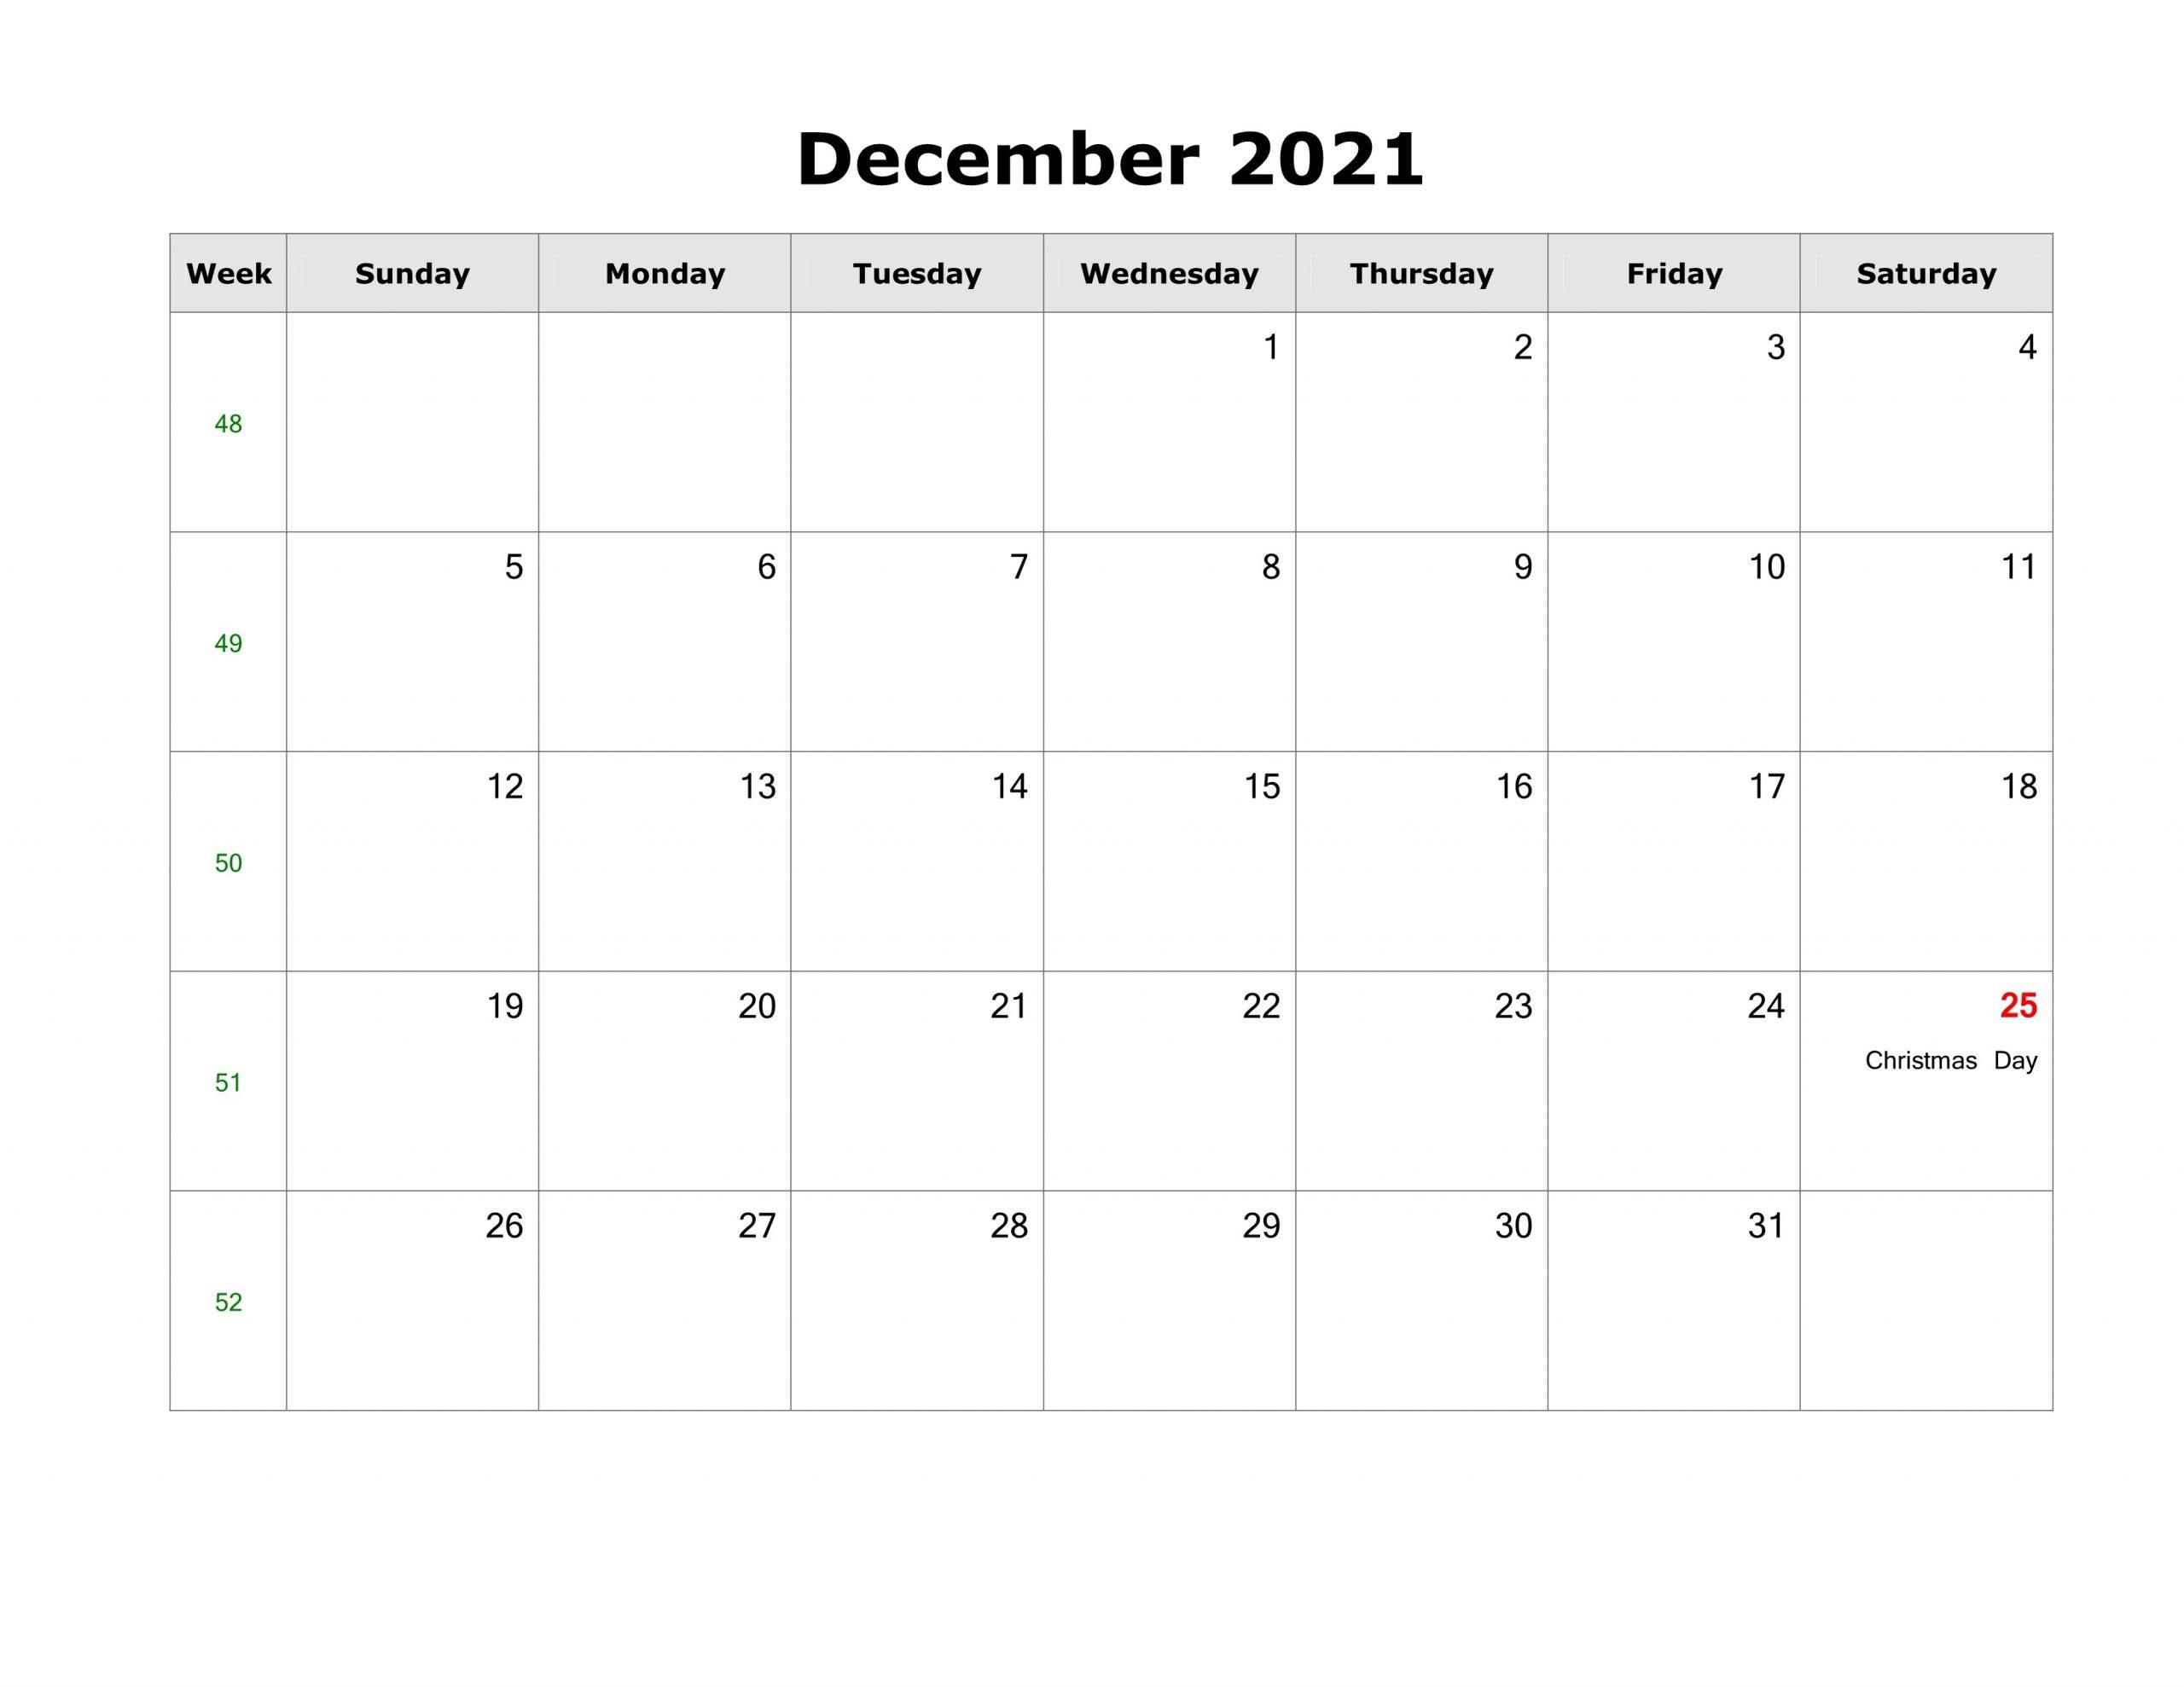 December 2021 Calendar Template Empty Evernote